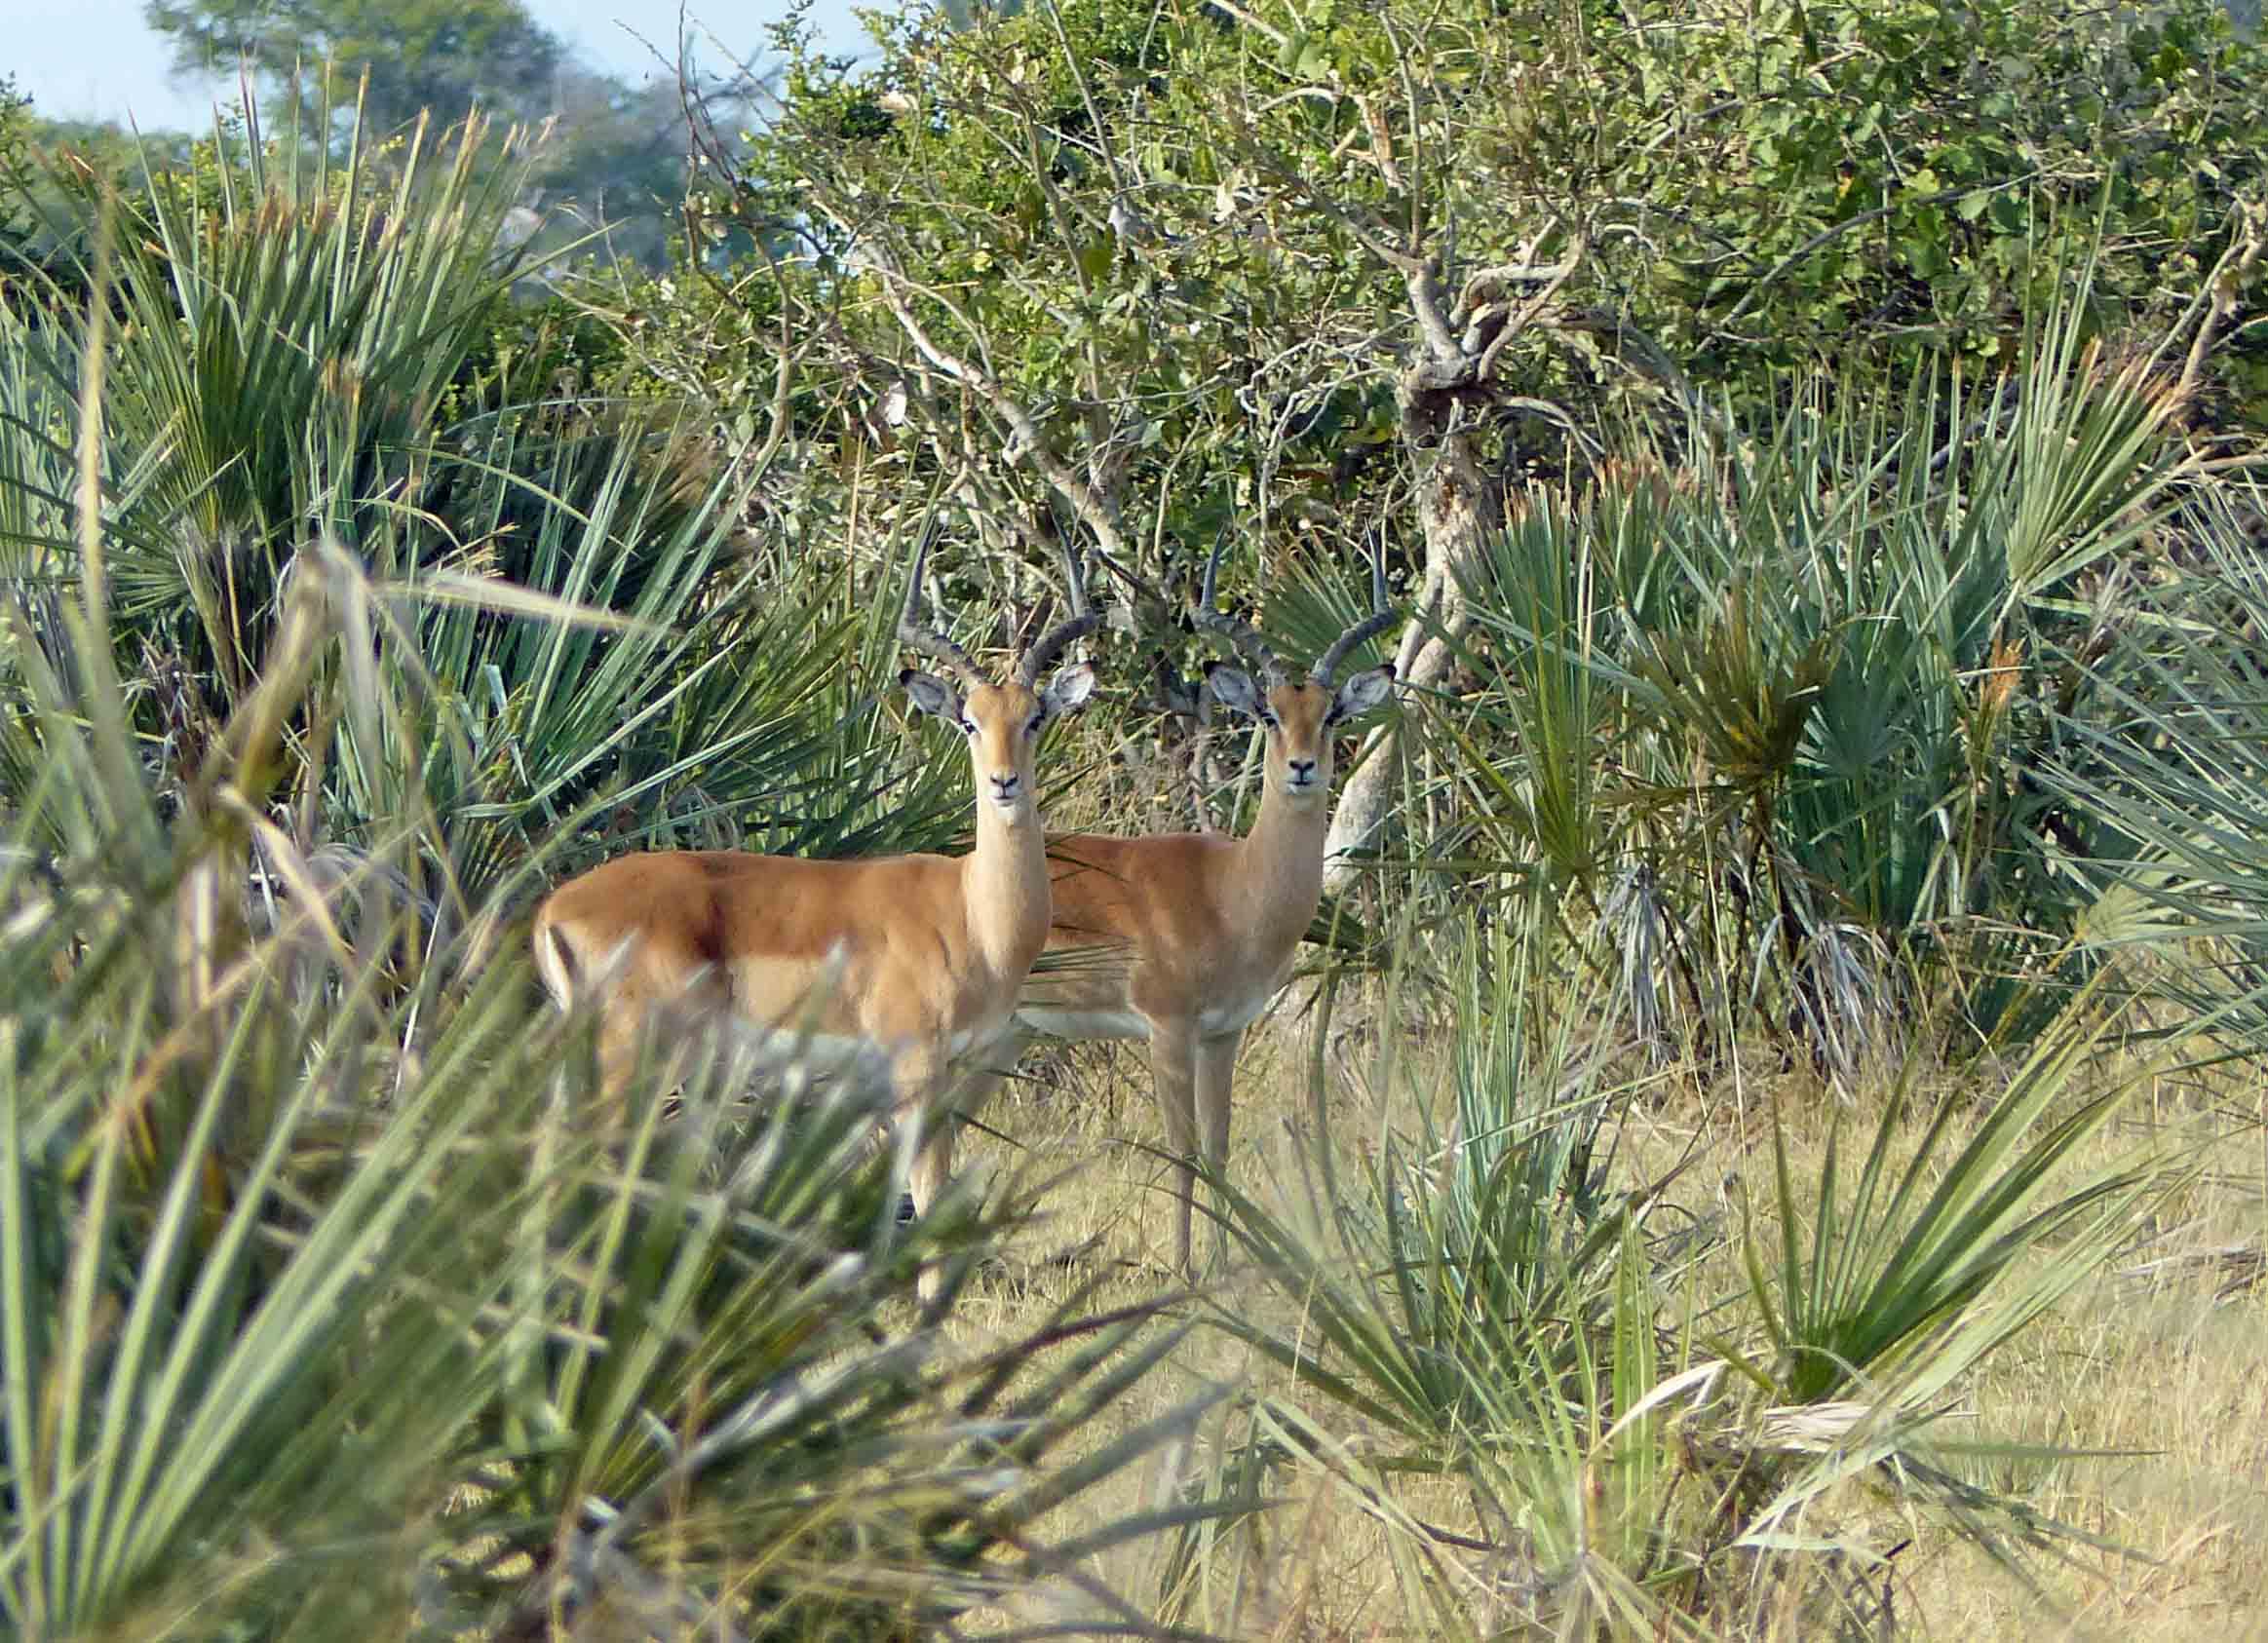 Two antelopes among vegetation